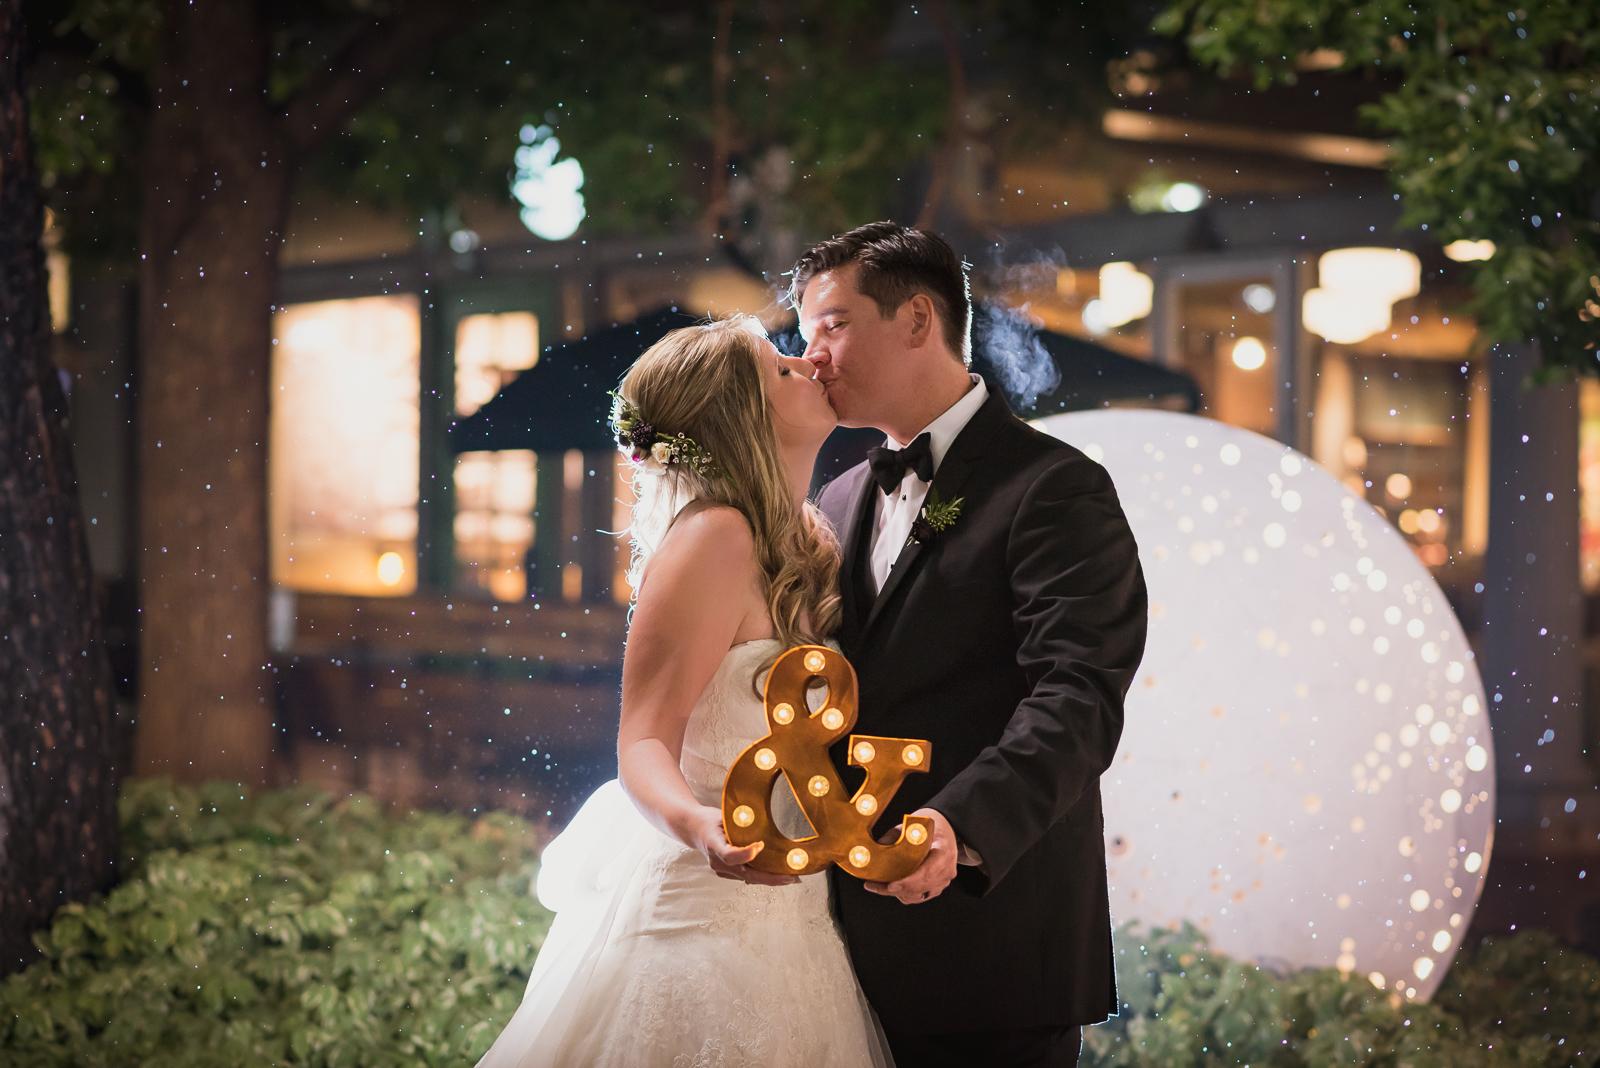 A Beary Foxy Wedding | Wedding Photo| Lily Lake Estes Park | From the Hip Photo